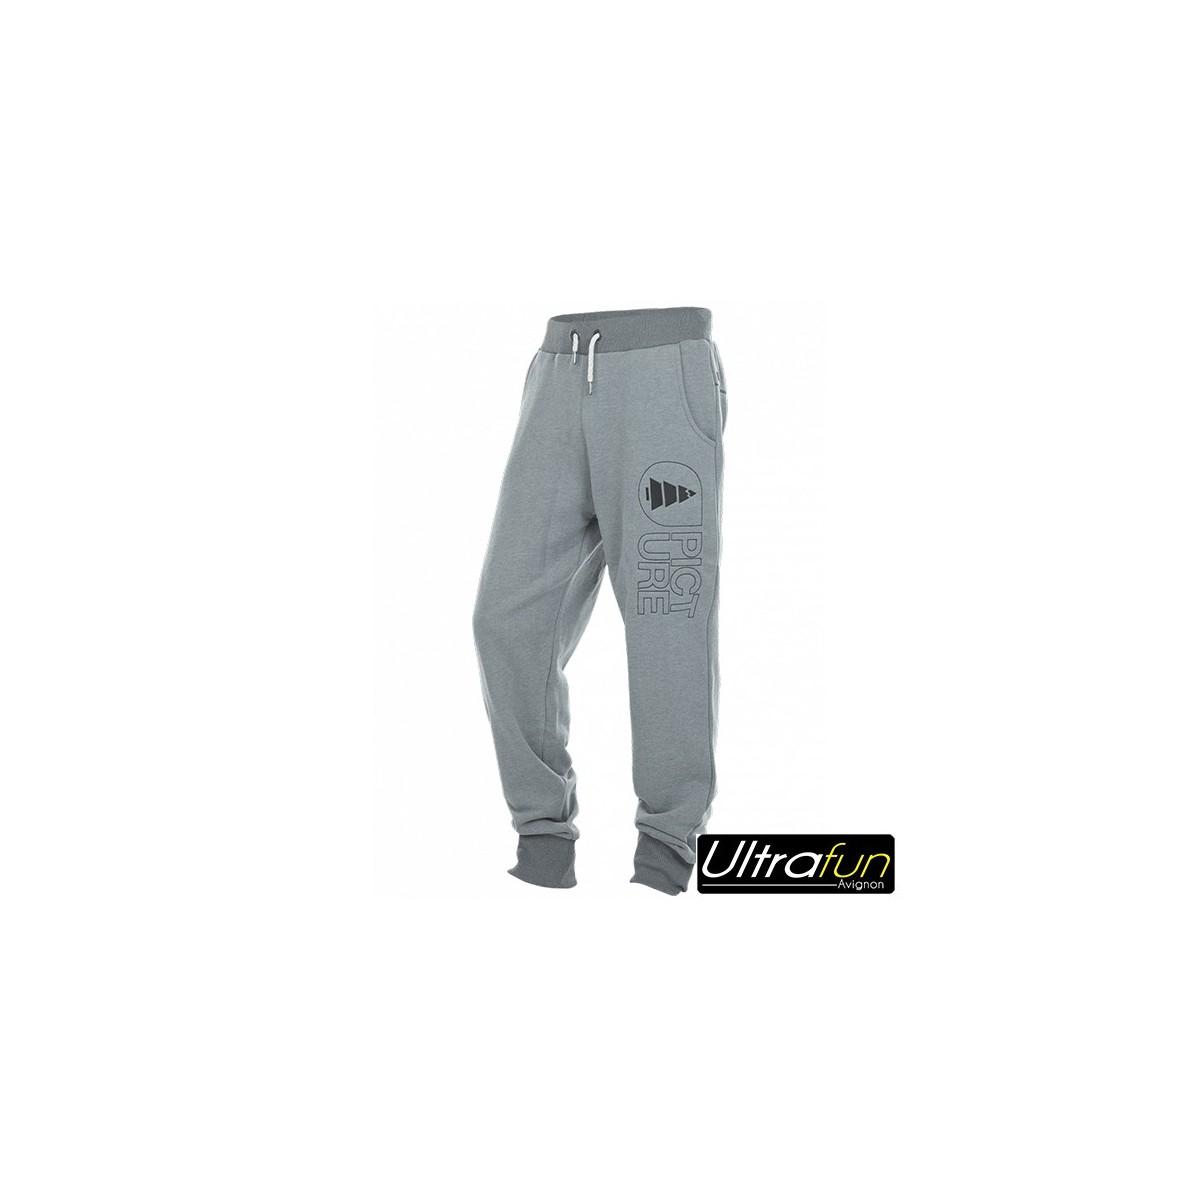 Gris Fun Picture Homme Jogging De Chill Ultra Pantalon wffvPq6X